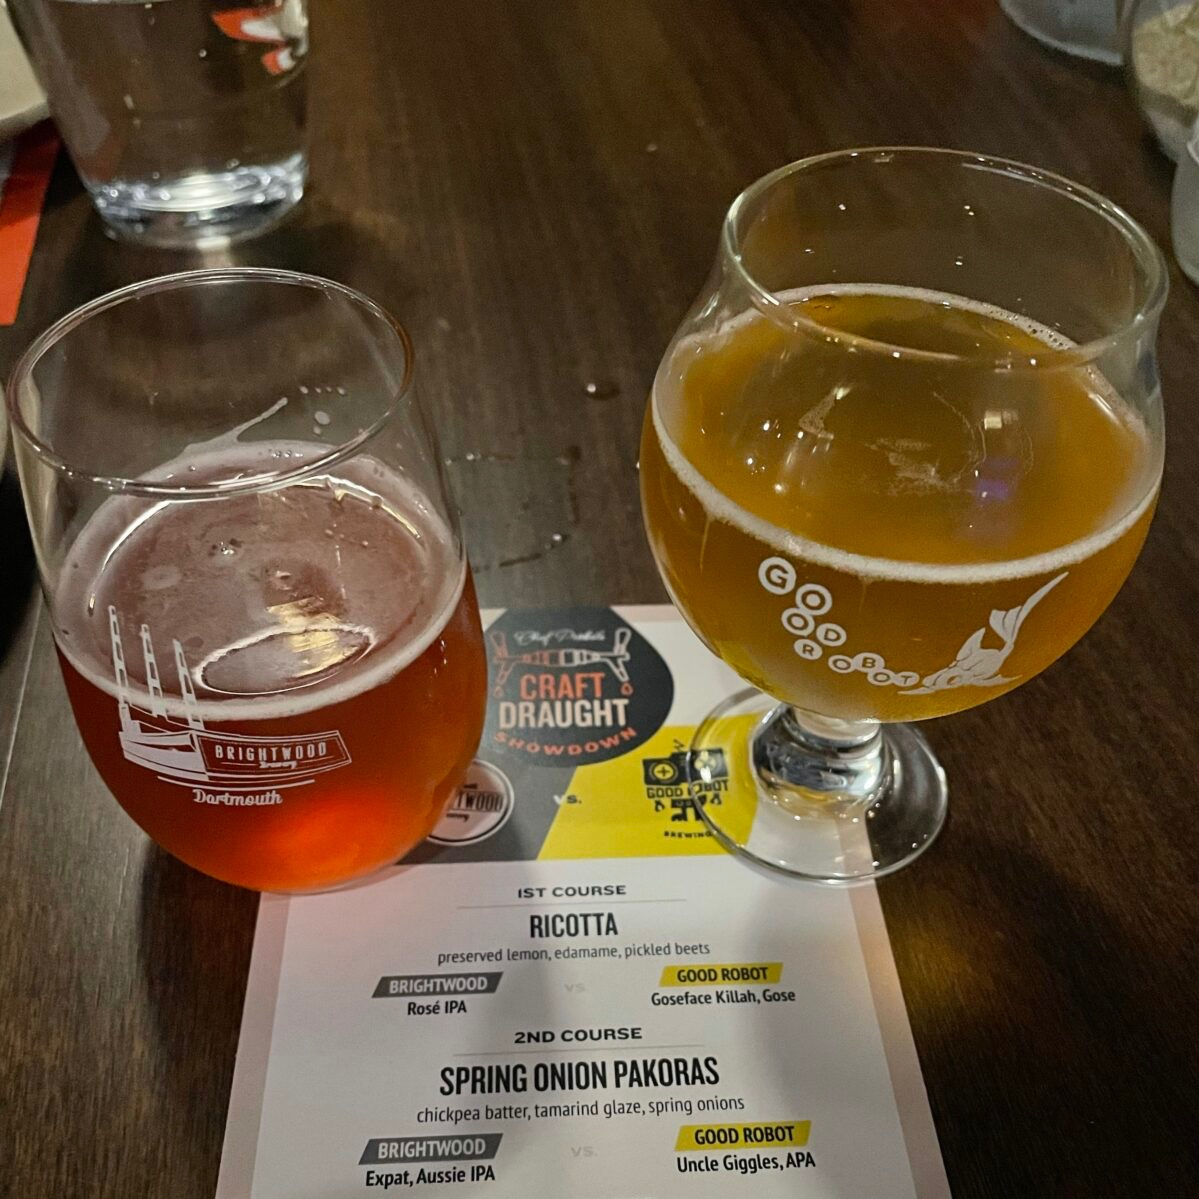 Round 1 beers